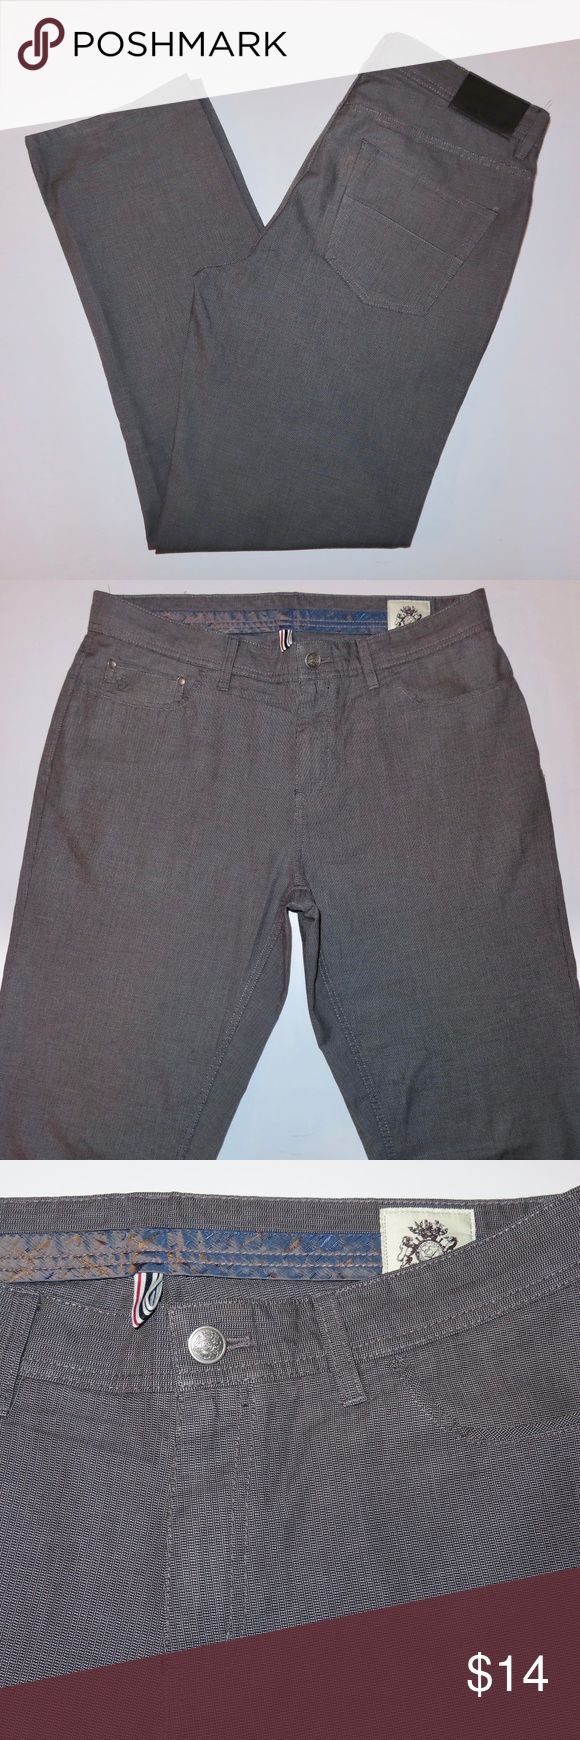 English Laundry Mens Pants 34x32 Walker Grey English Laundry Mens